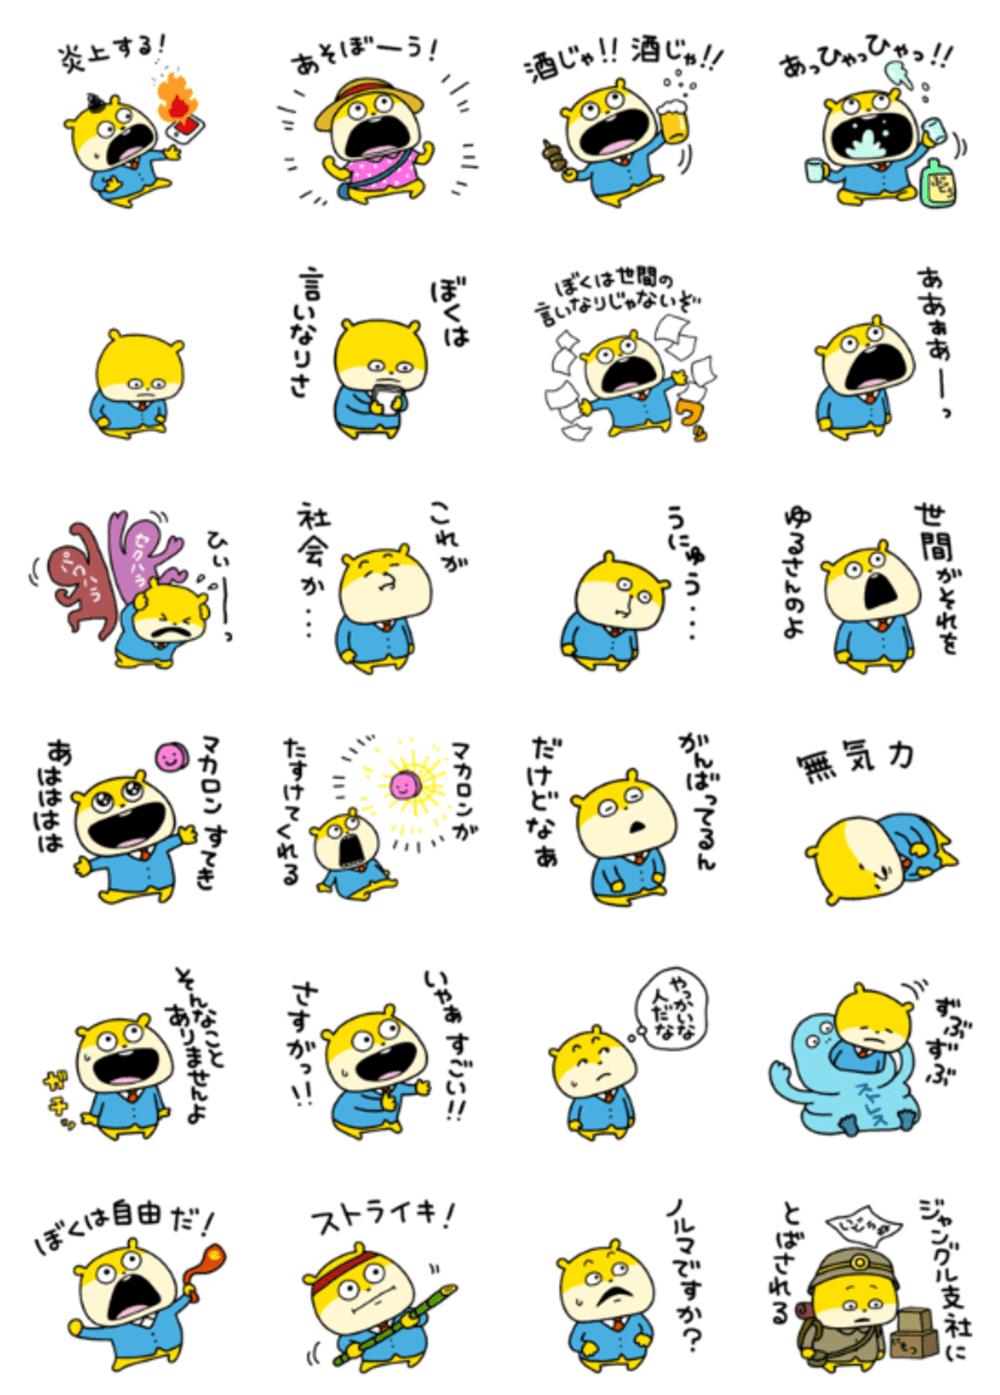 SnapCrab_NoName_2019-6-3_17-6-49_No-00 (1)